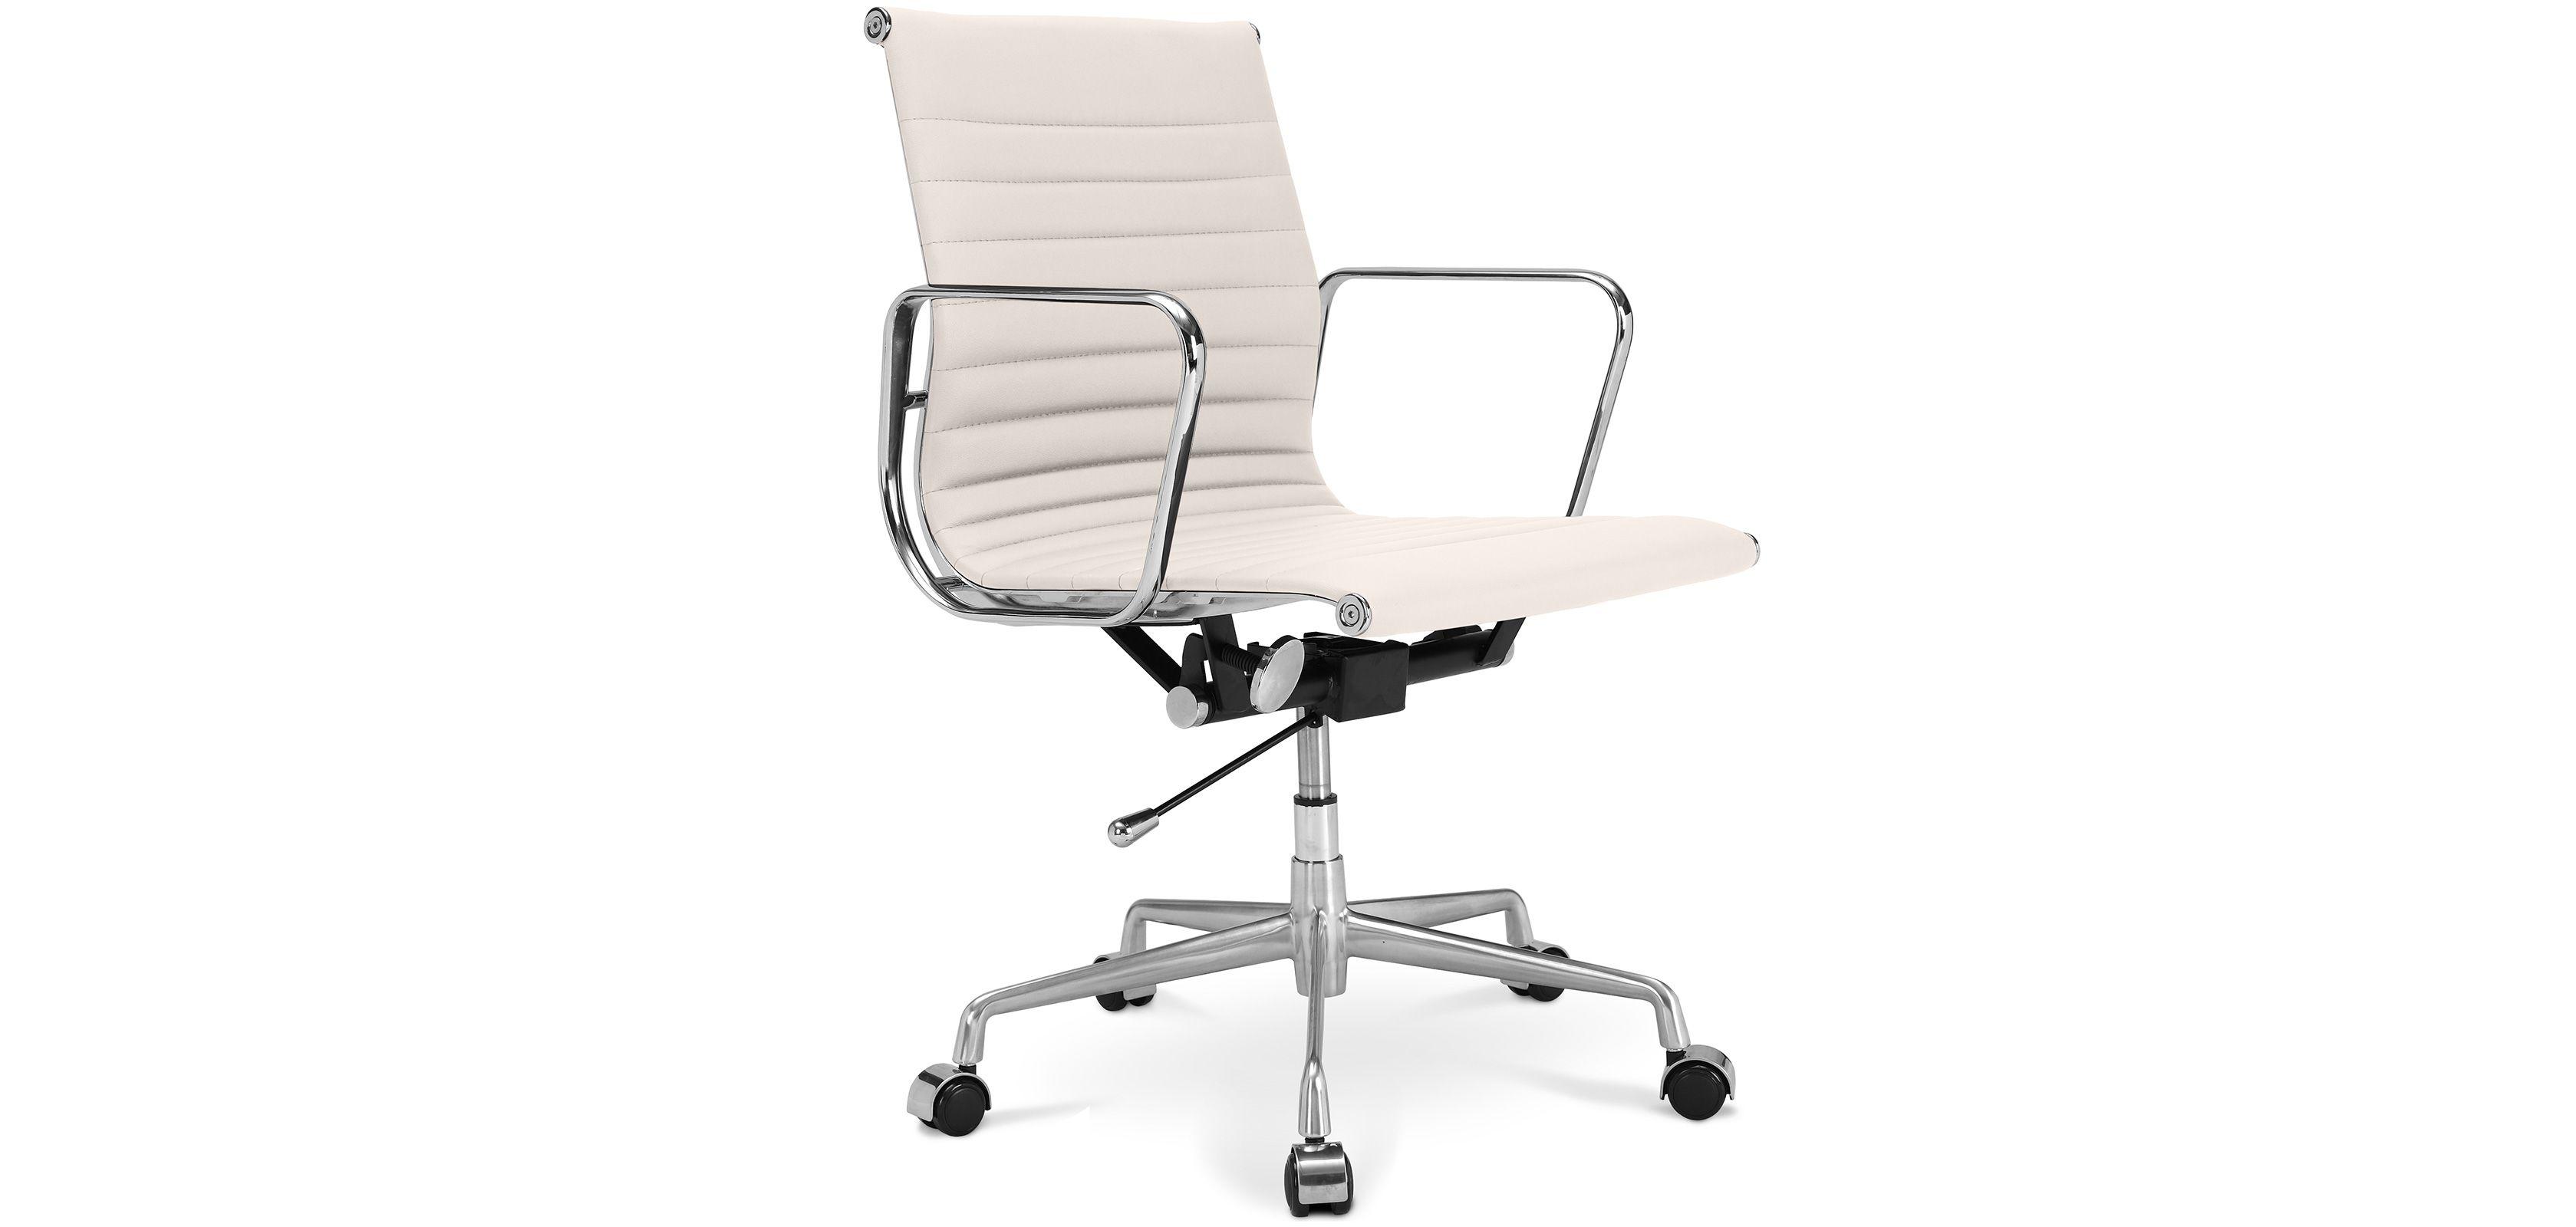 Chaise Bureau Style Alu Group Ea 117 Eames Cuir Premium Roulettes Office Chair Chair Loft Living